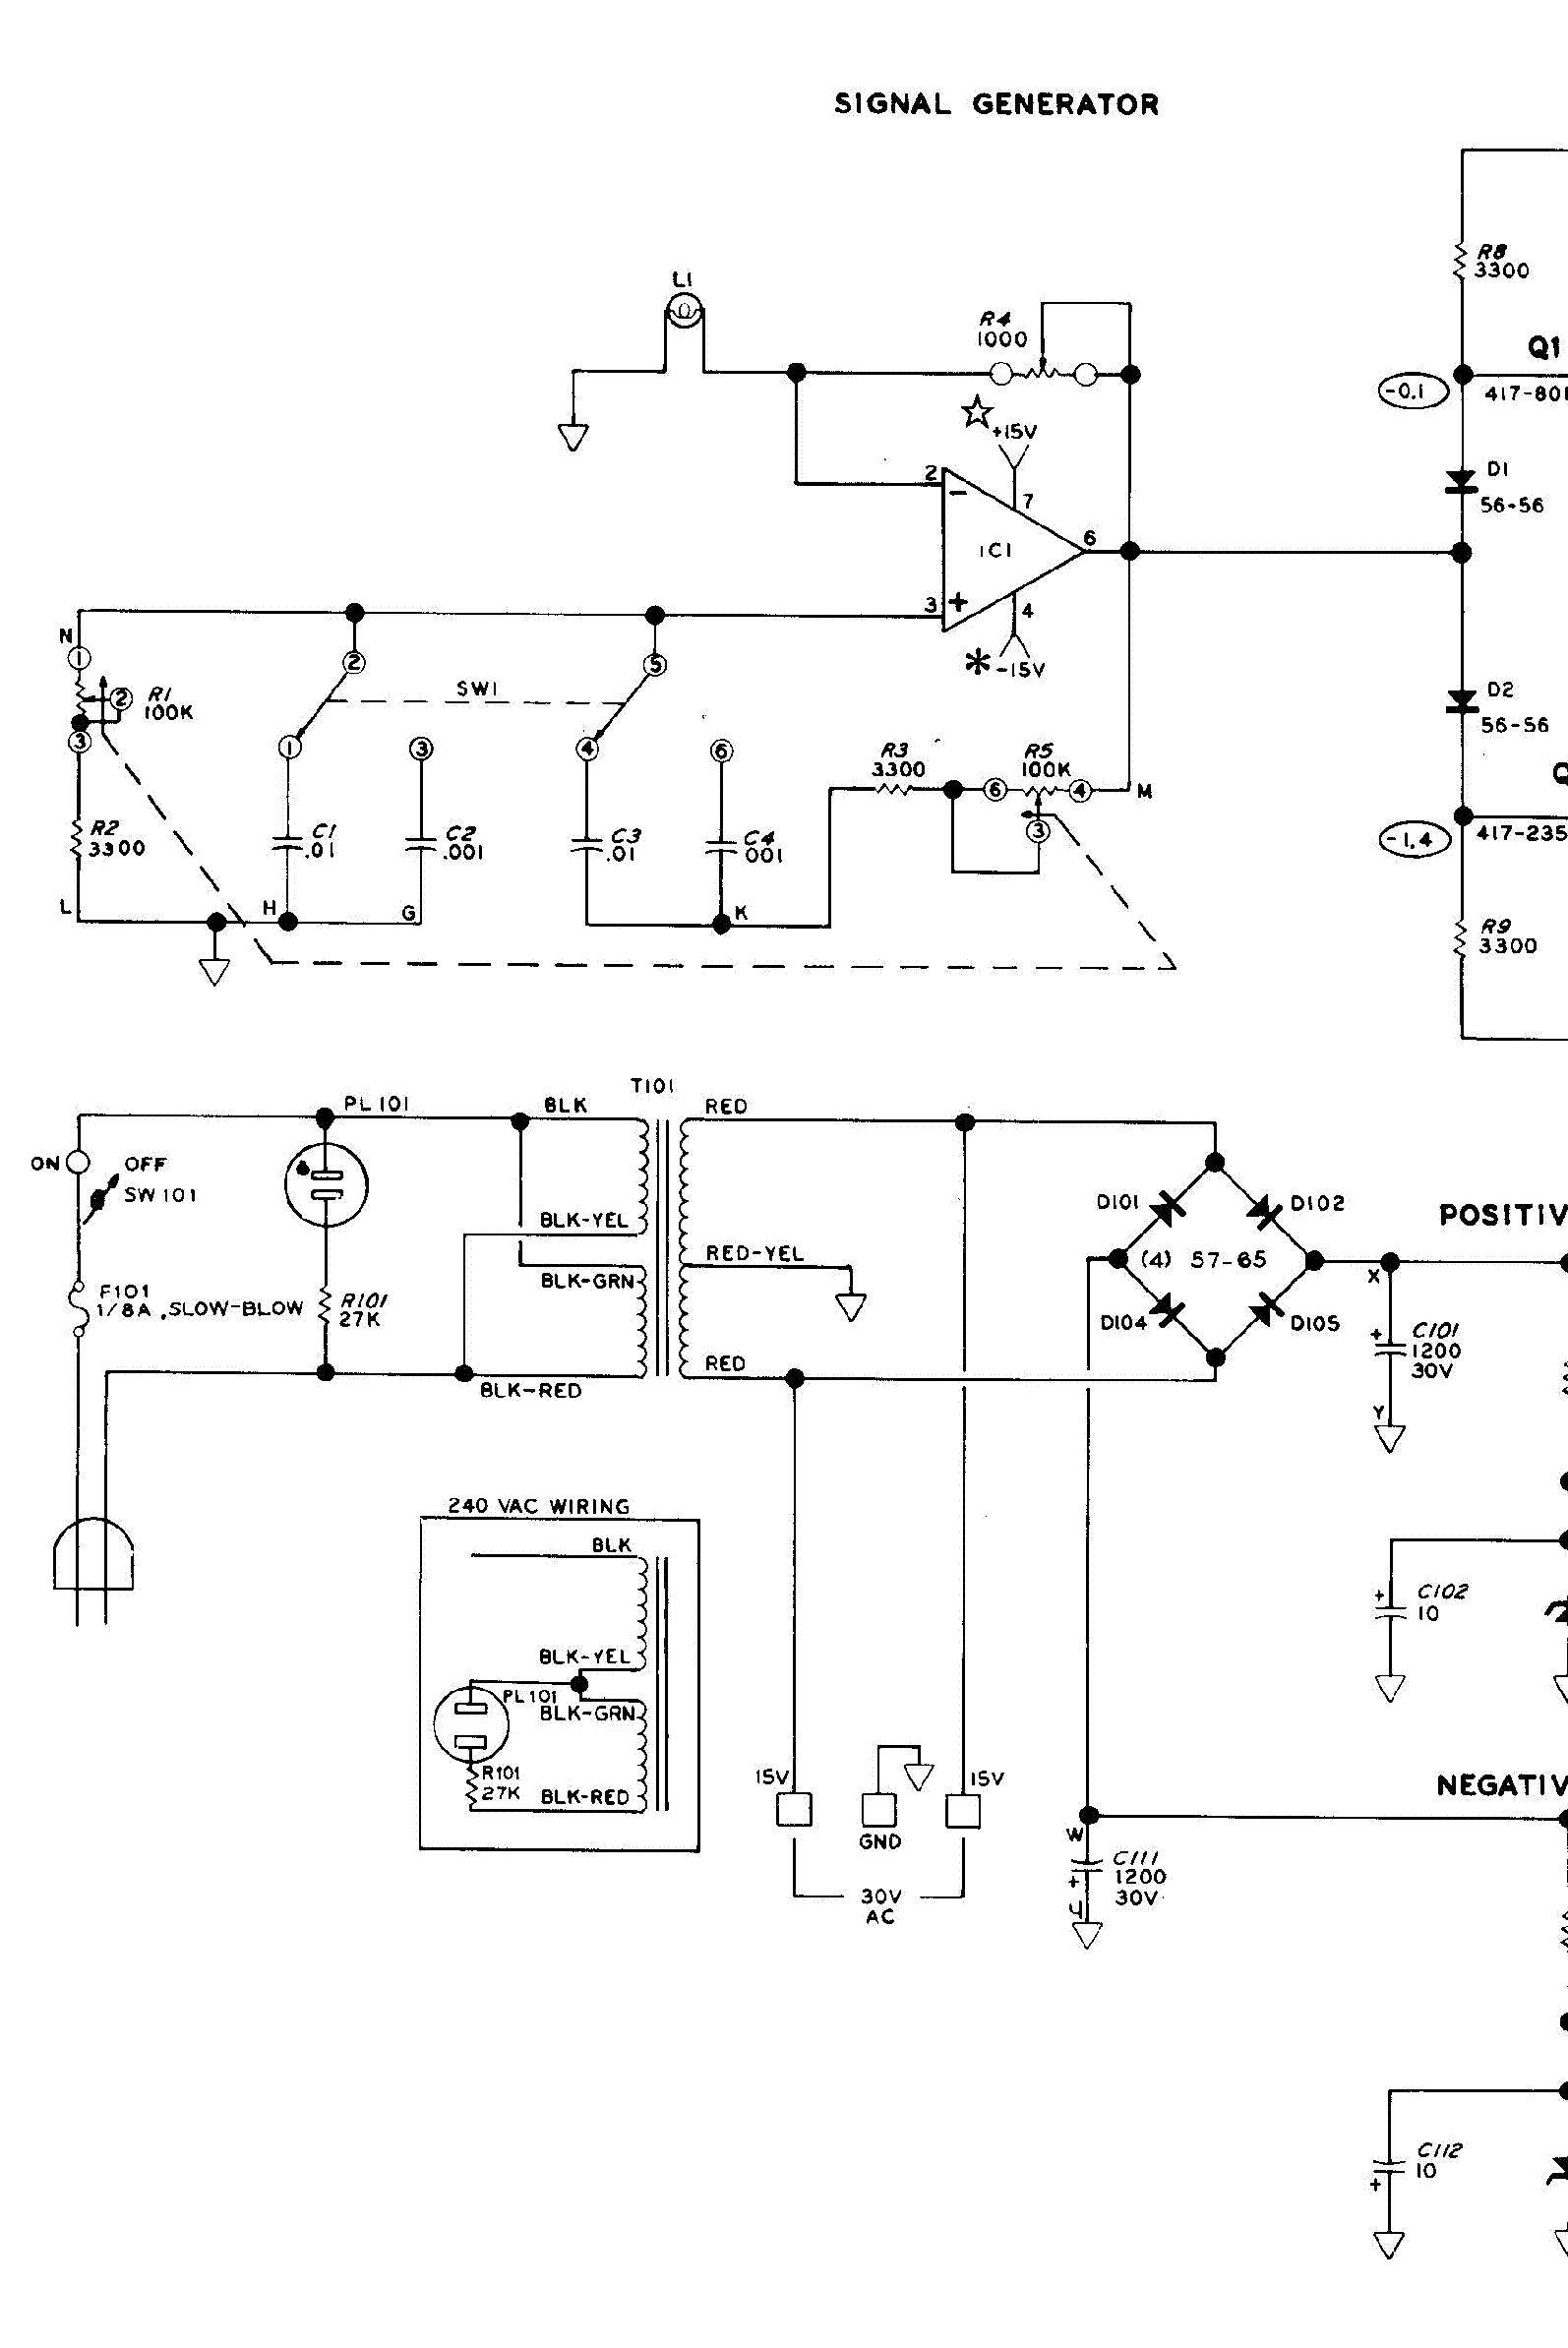 Heathkit Sg8 Signal Generator Sch Service Manual Download